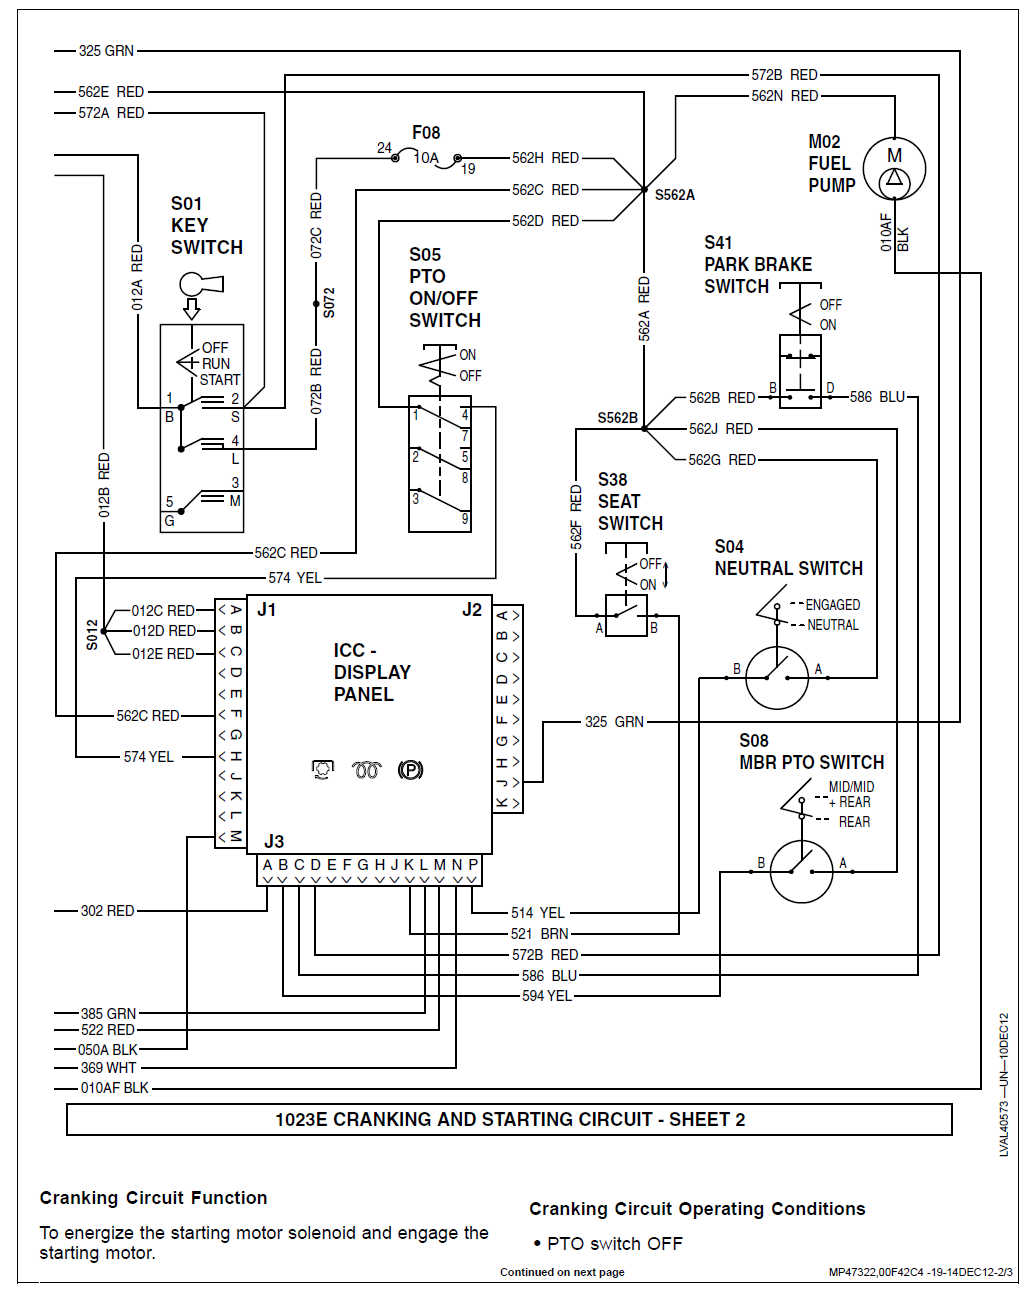 Diagnose Fuel Solenoid 1023